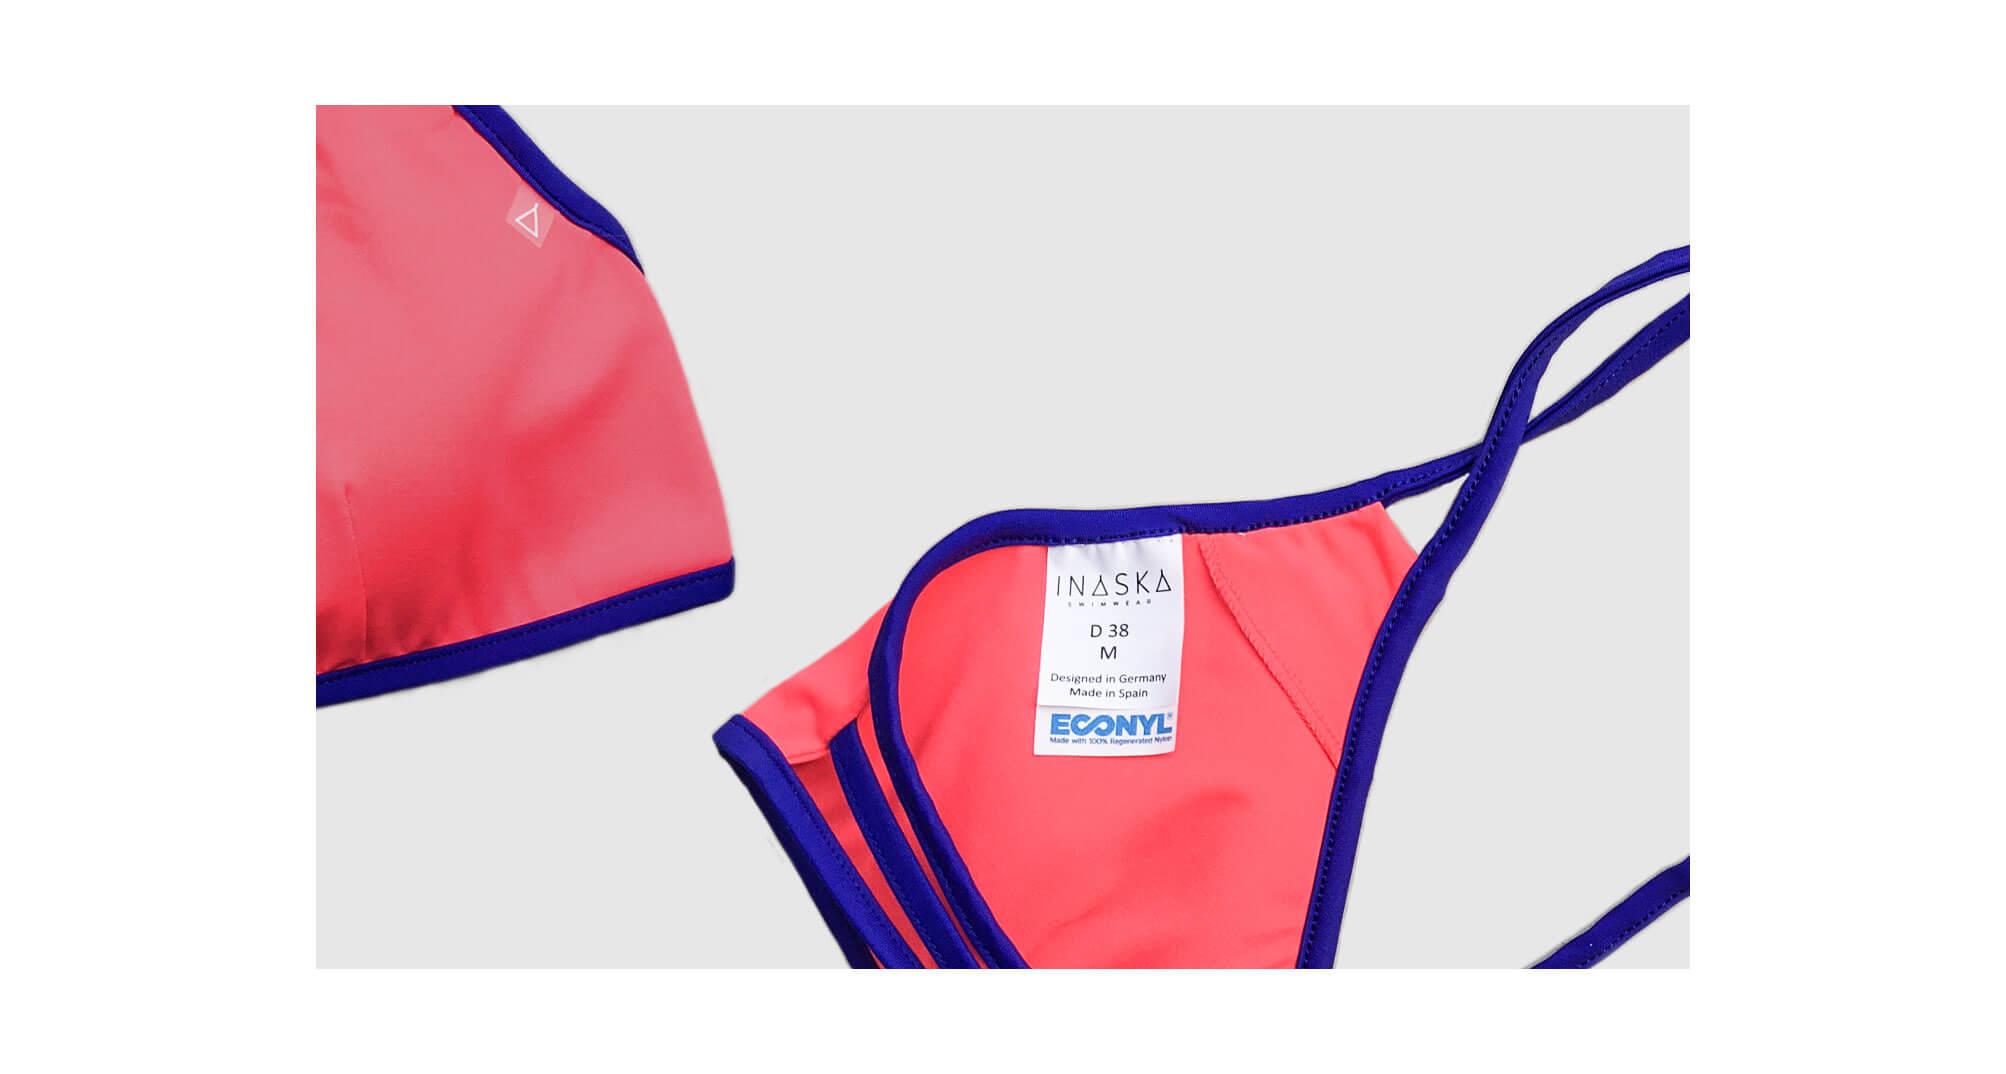 360VIER_Inaska_Case-Study_Slider-02 Inaska Swimwear